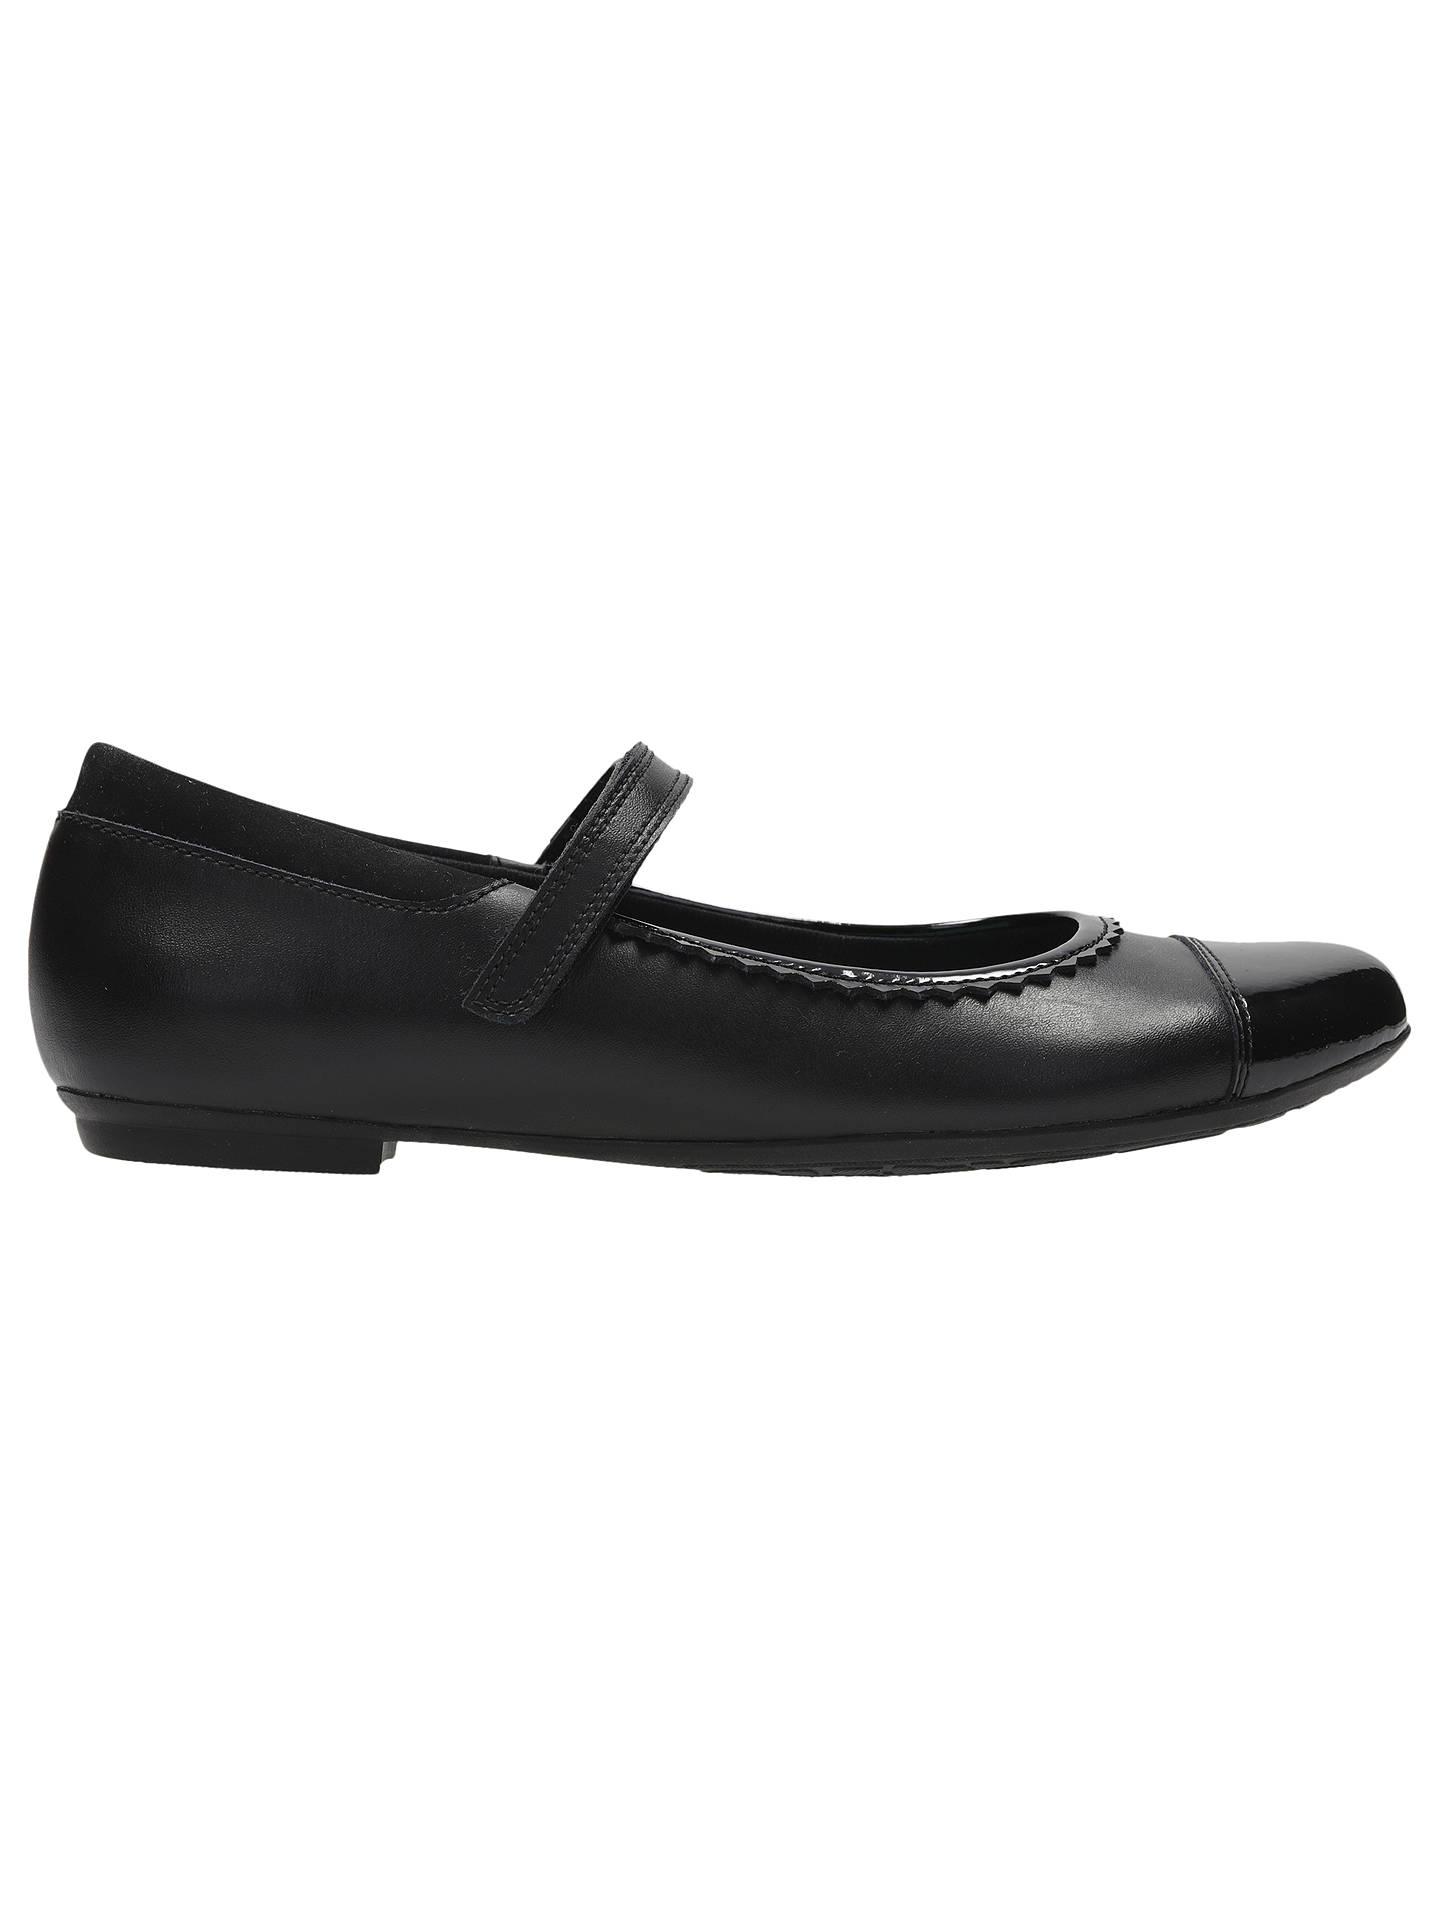 1bbeec7aa Buy Clarks Children s Tizz Ace Leather School Shoes